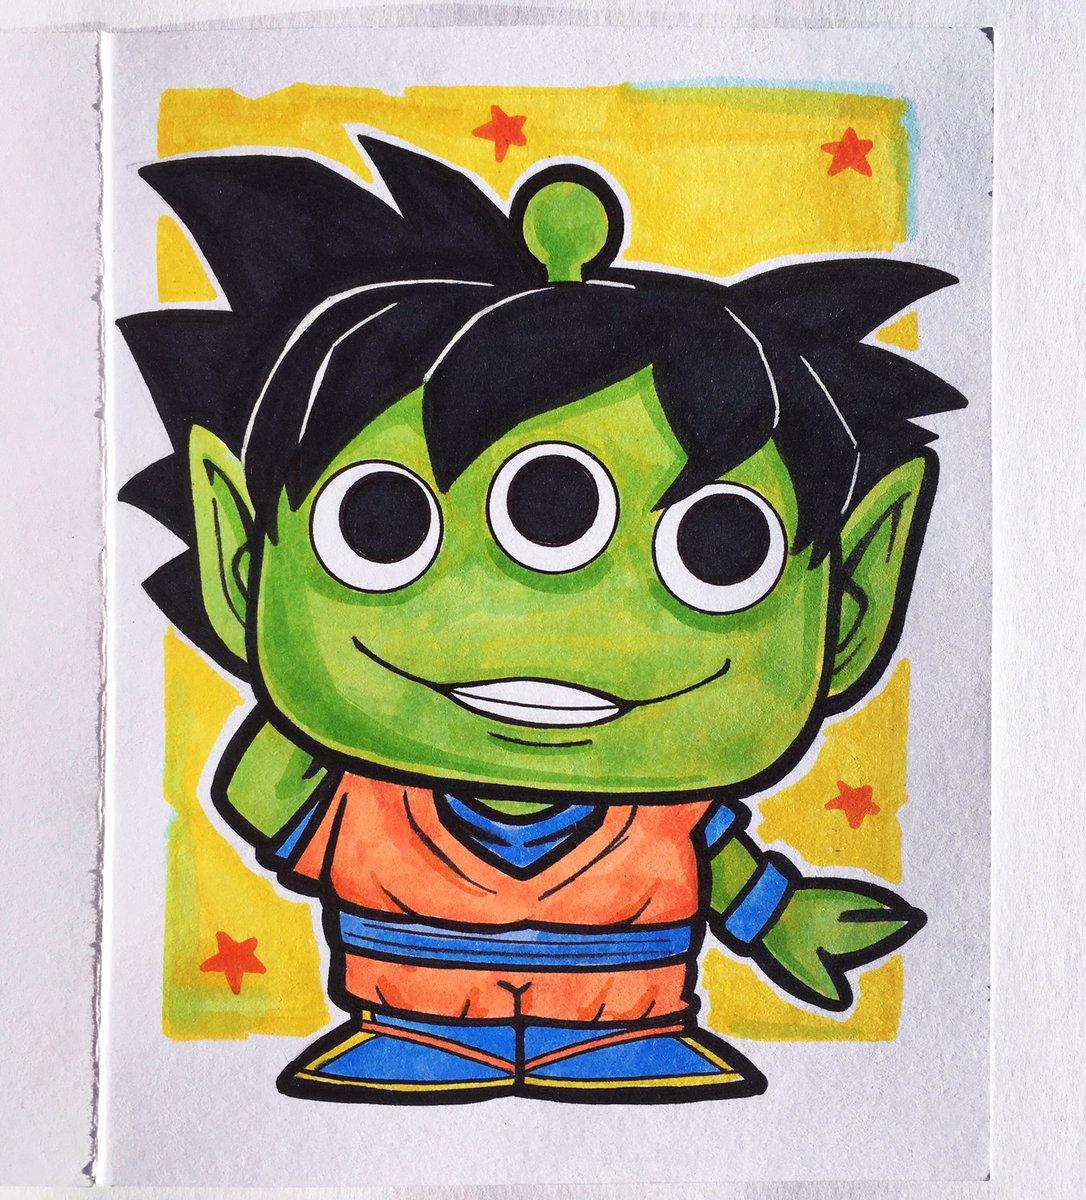 Disney Pixar Alien Remix - Alien as Goku  #alienremix #funkoalienremix #dragonball #goku #funkoconcepts #alienremixconcept #funkopixar #toystory https://t.co/gQCK7yf9Wn